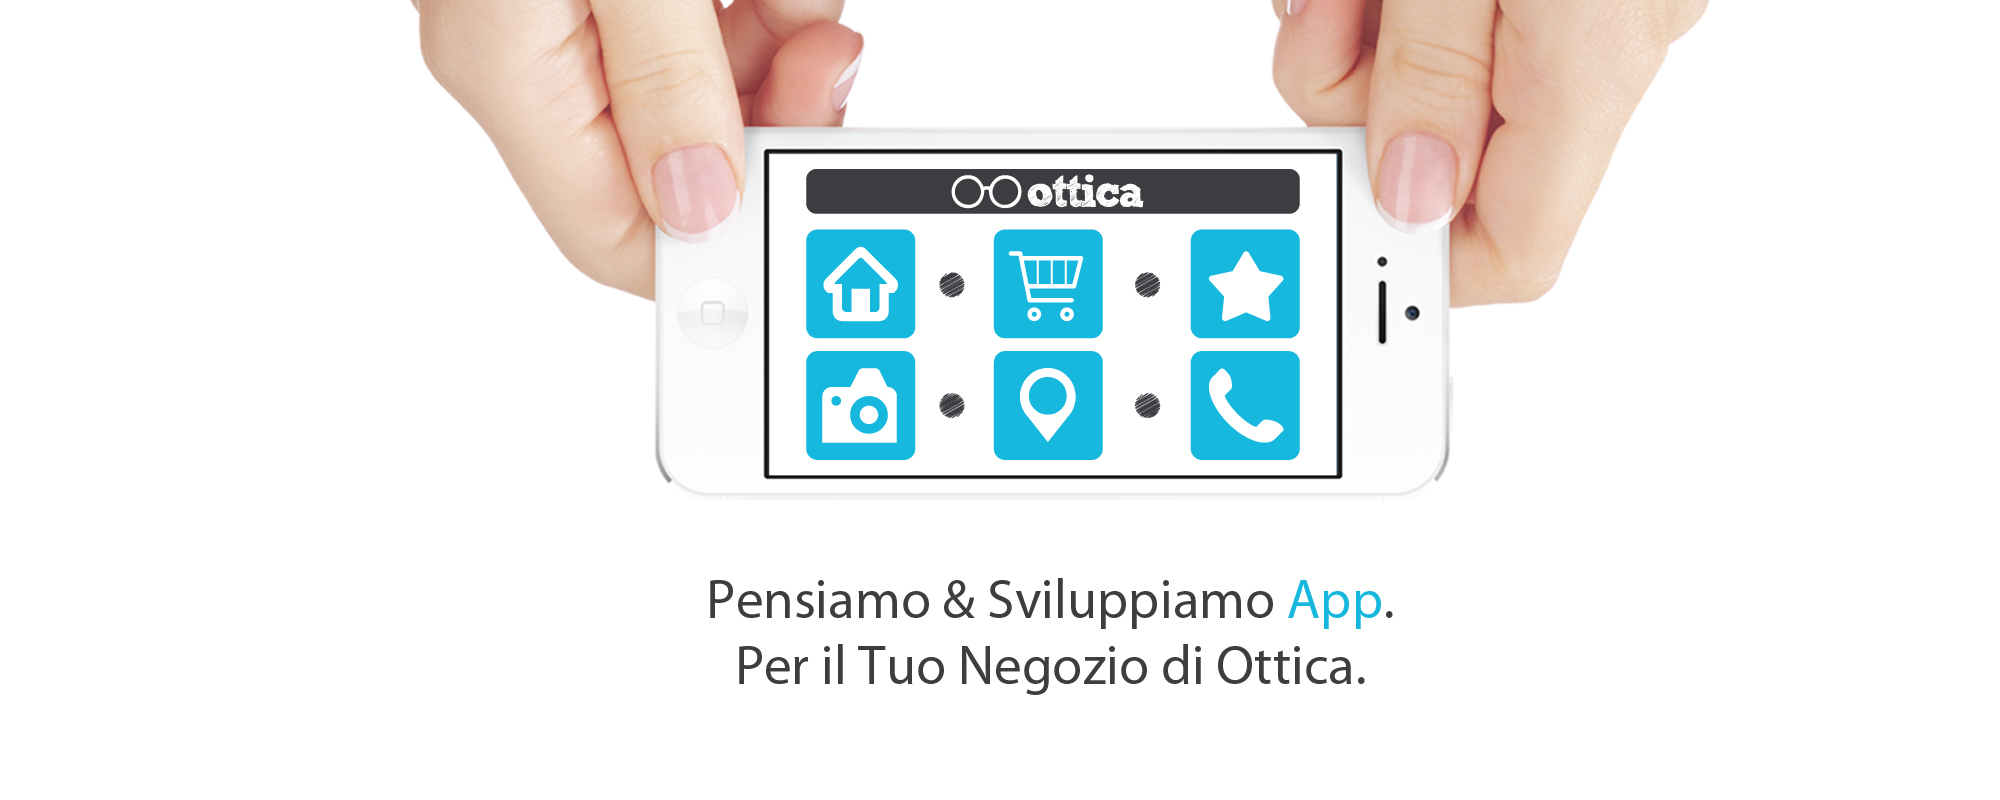 app per ottica